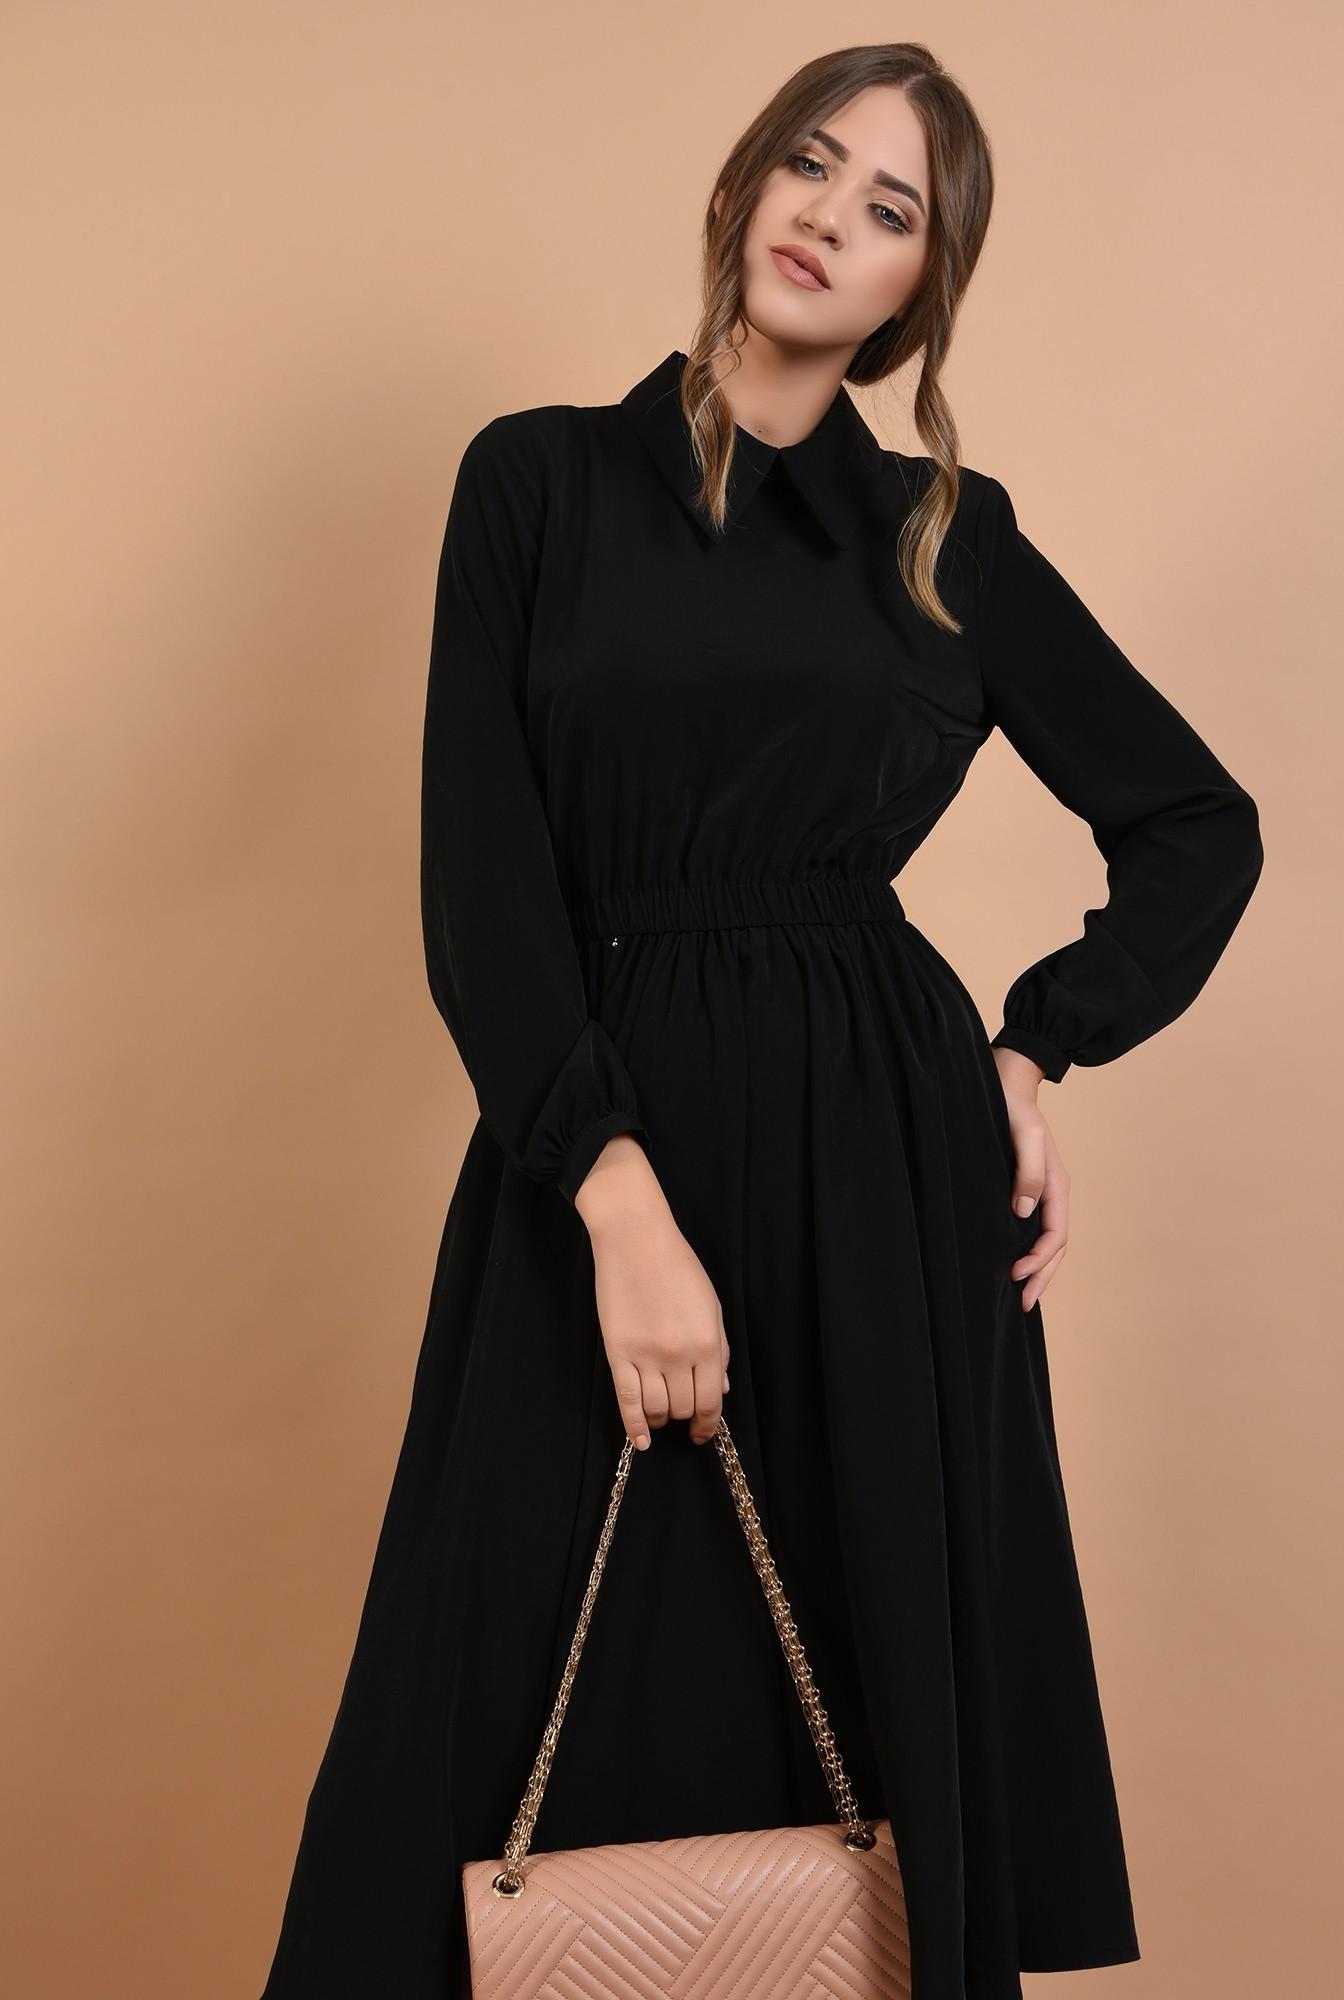 1 - 360 - rochie casual, midi, evazata, talie variabila, guler ascutit